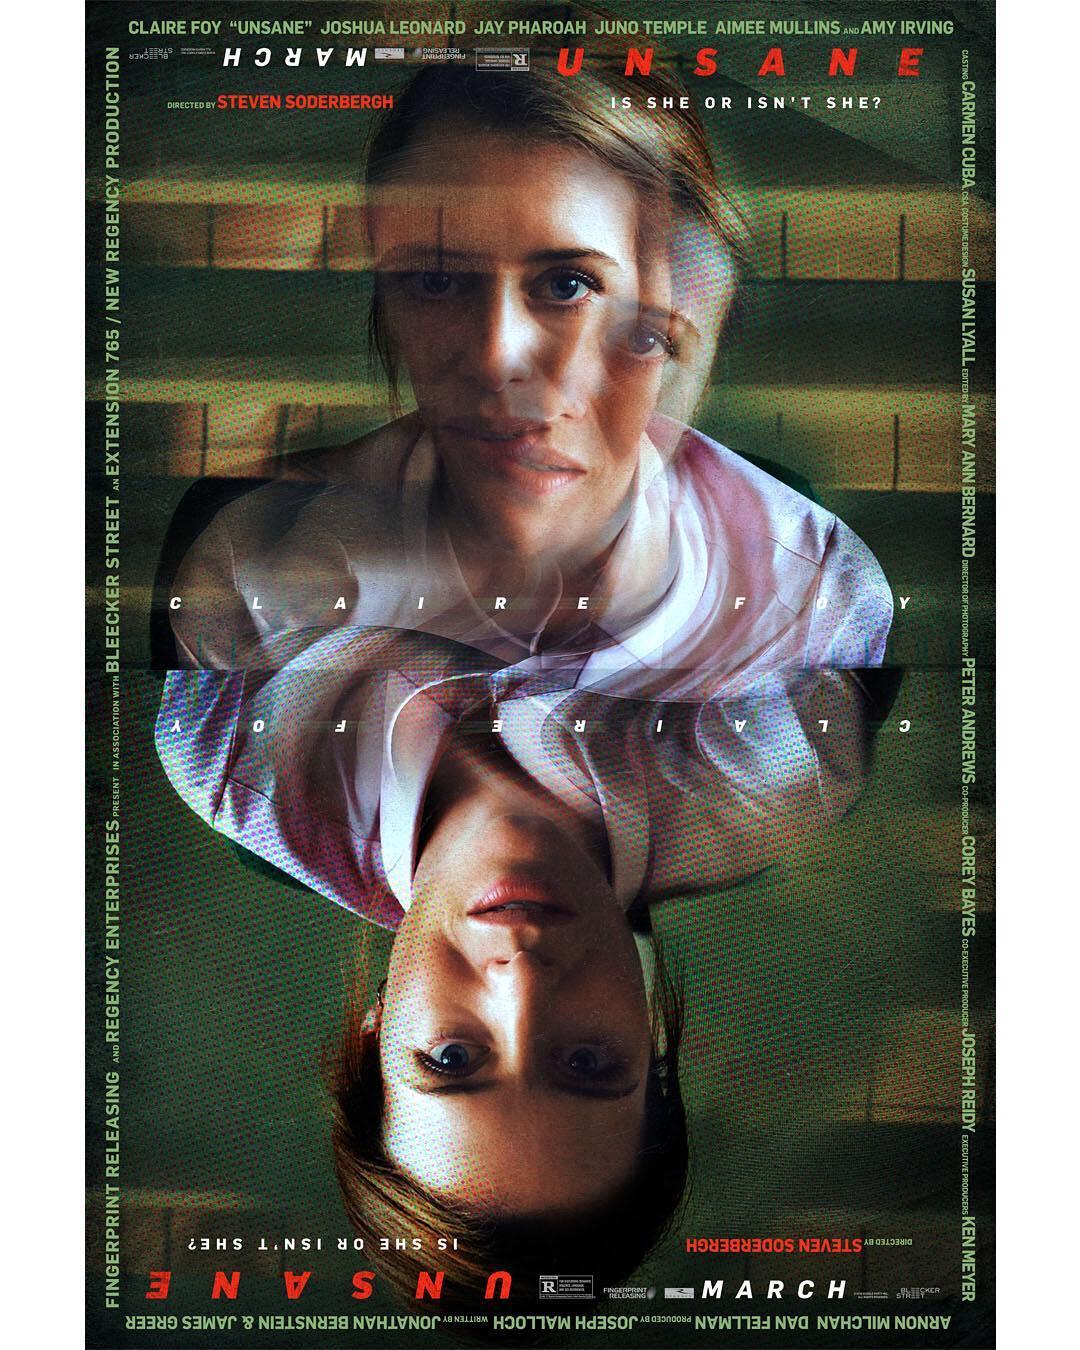 unsane-movie-poster-2018_orig